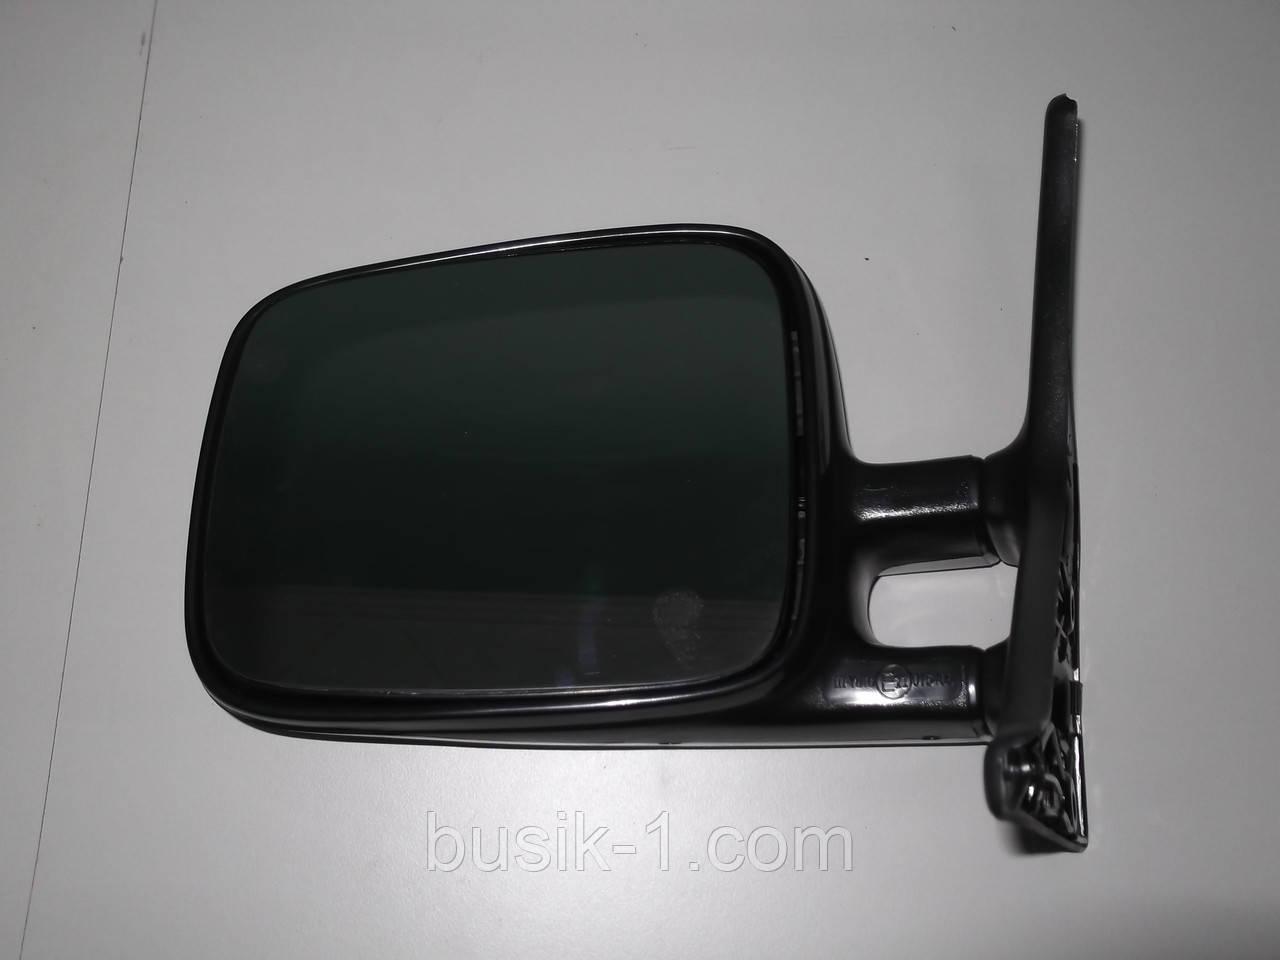 Зеркало заднего вида VW Transporter T4 90-03г.в., фото 1